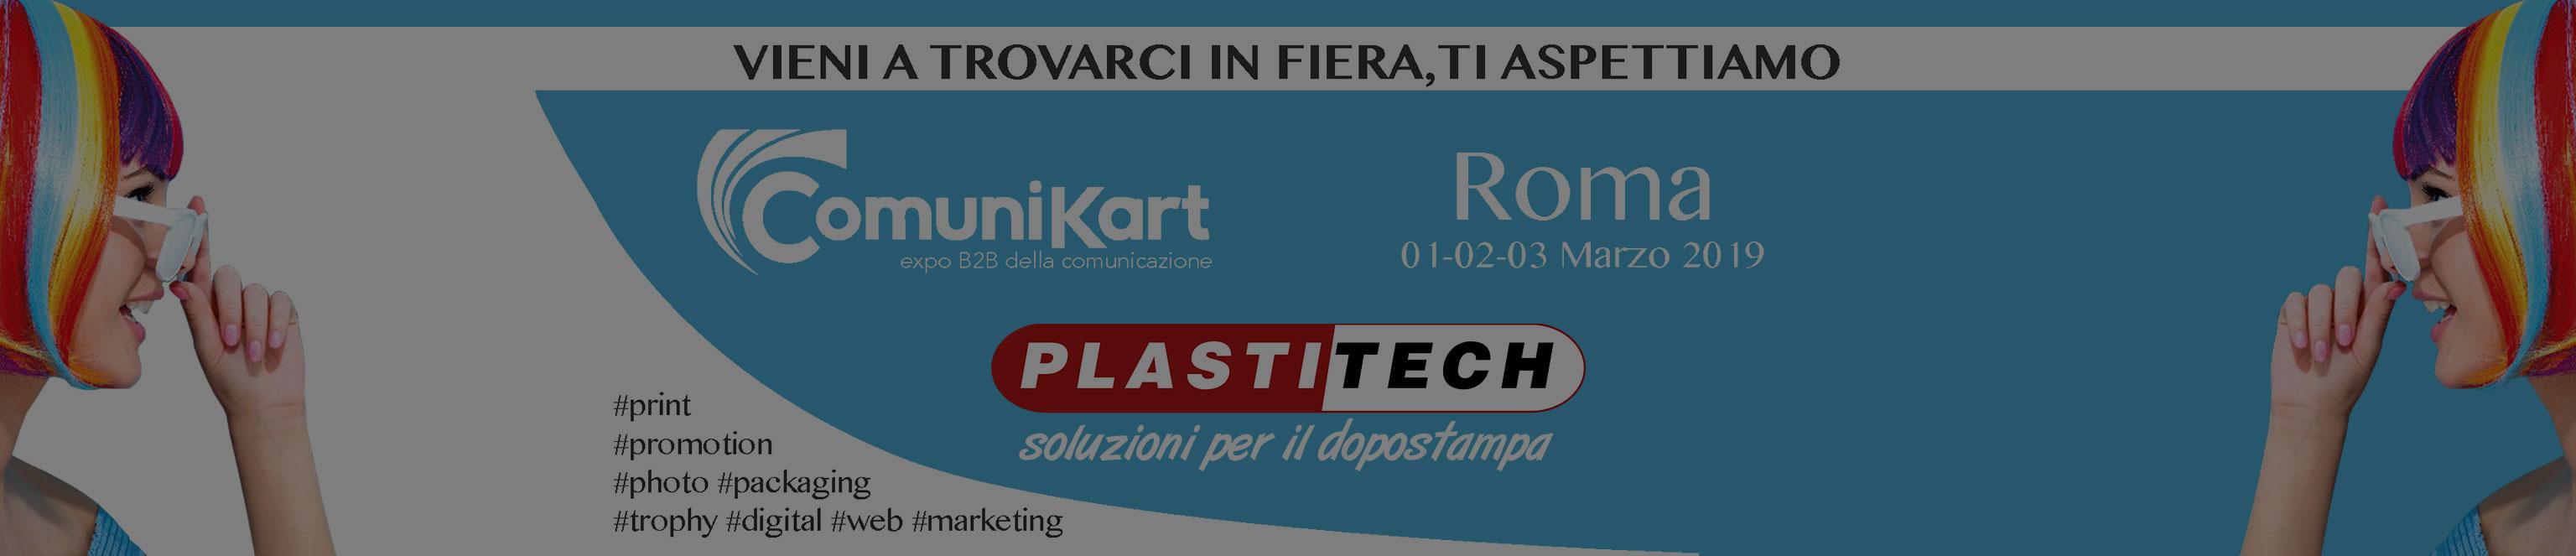 COMUNIKART-ROMA-2018-PLASTITECH